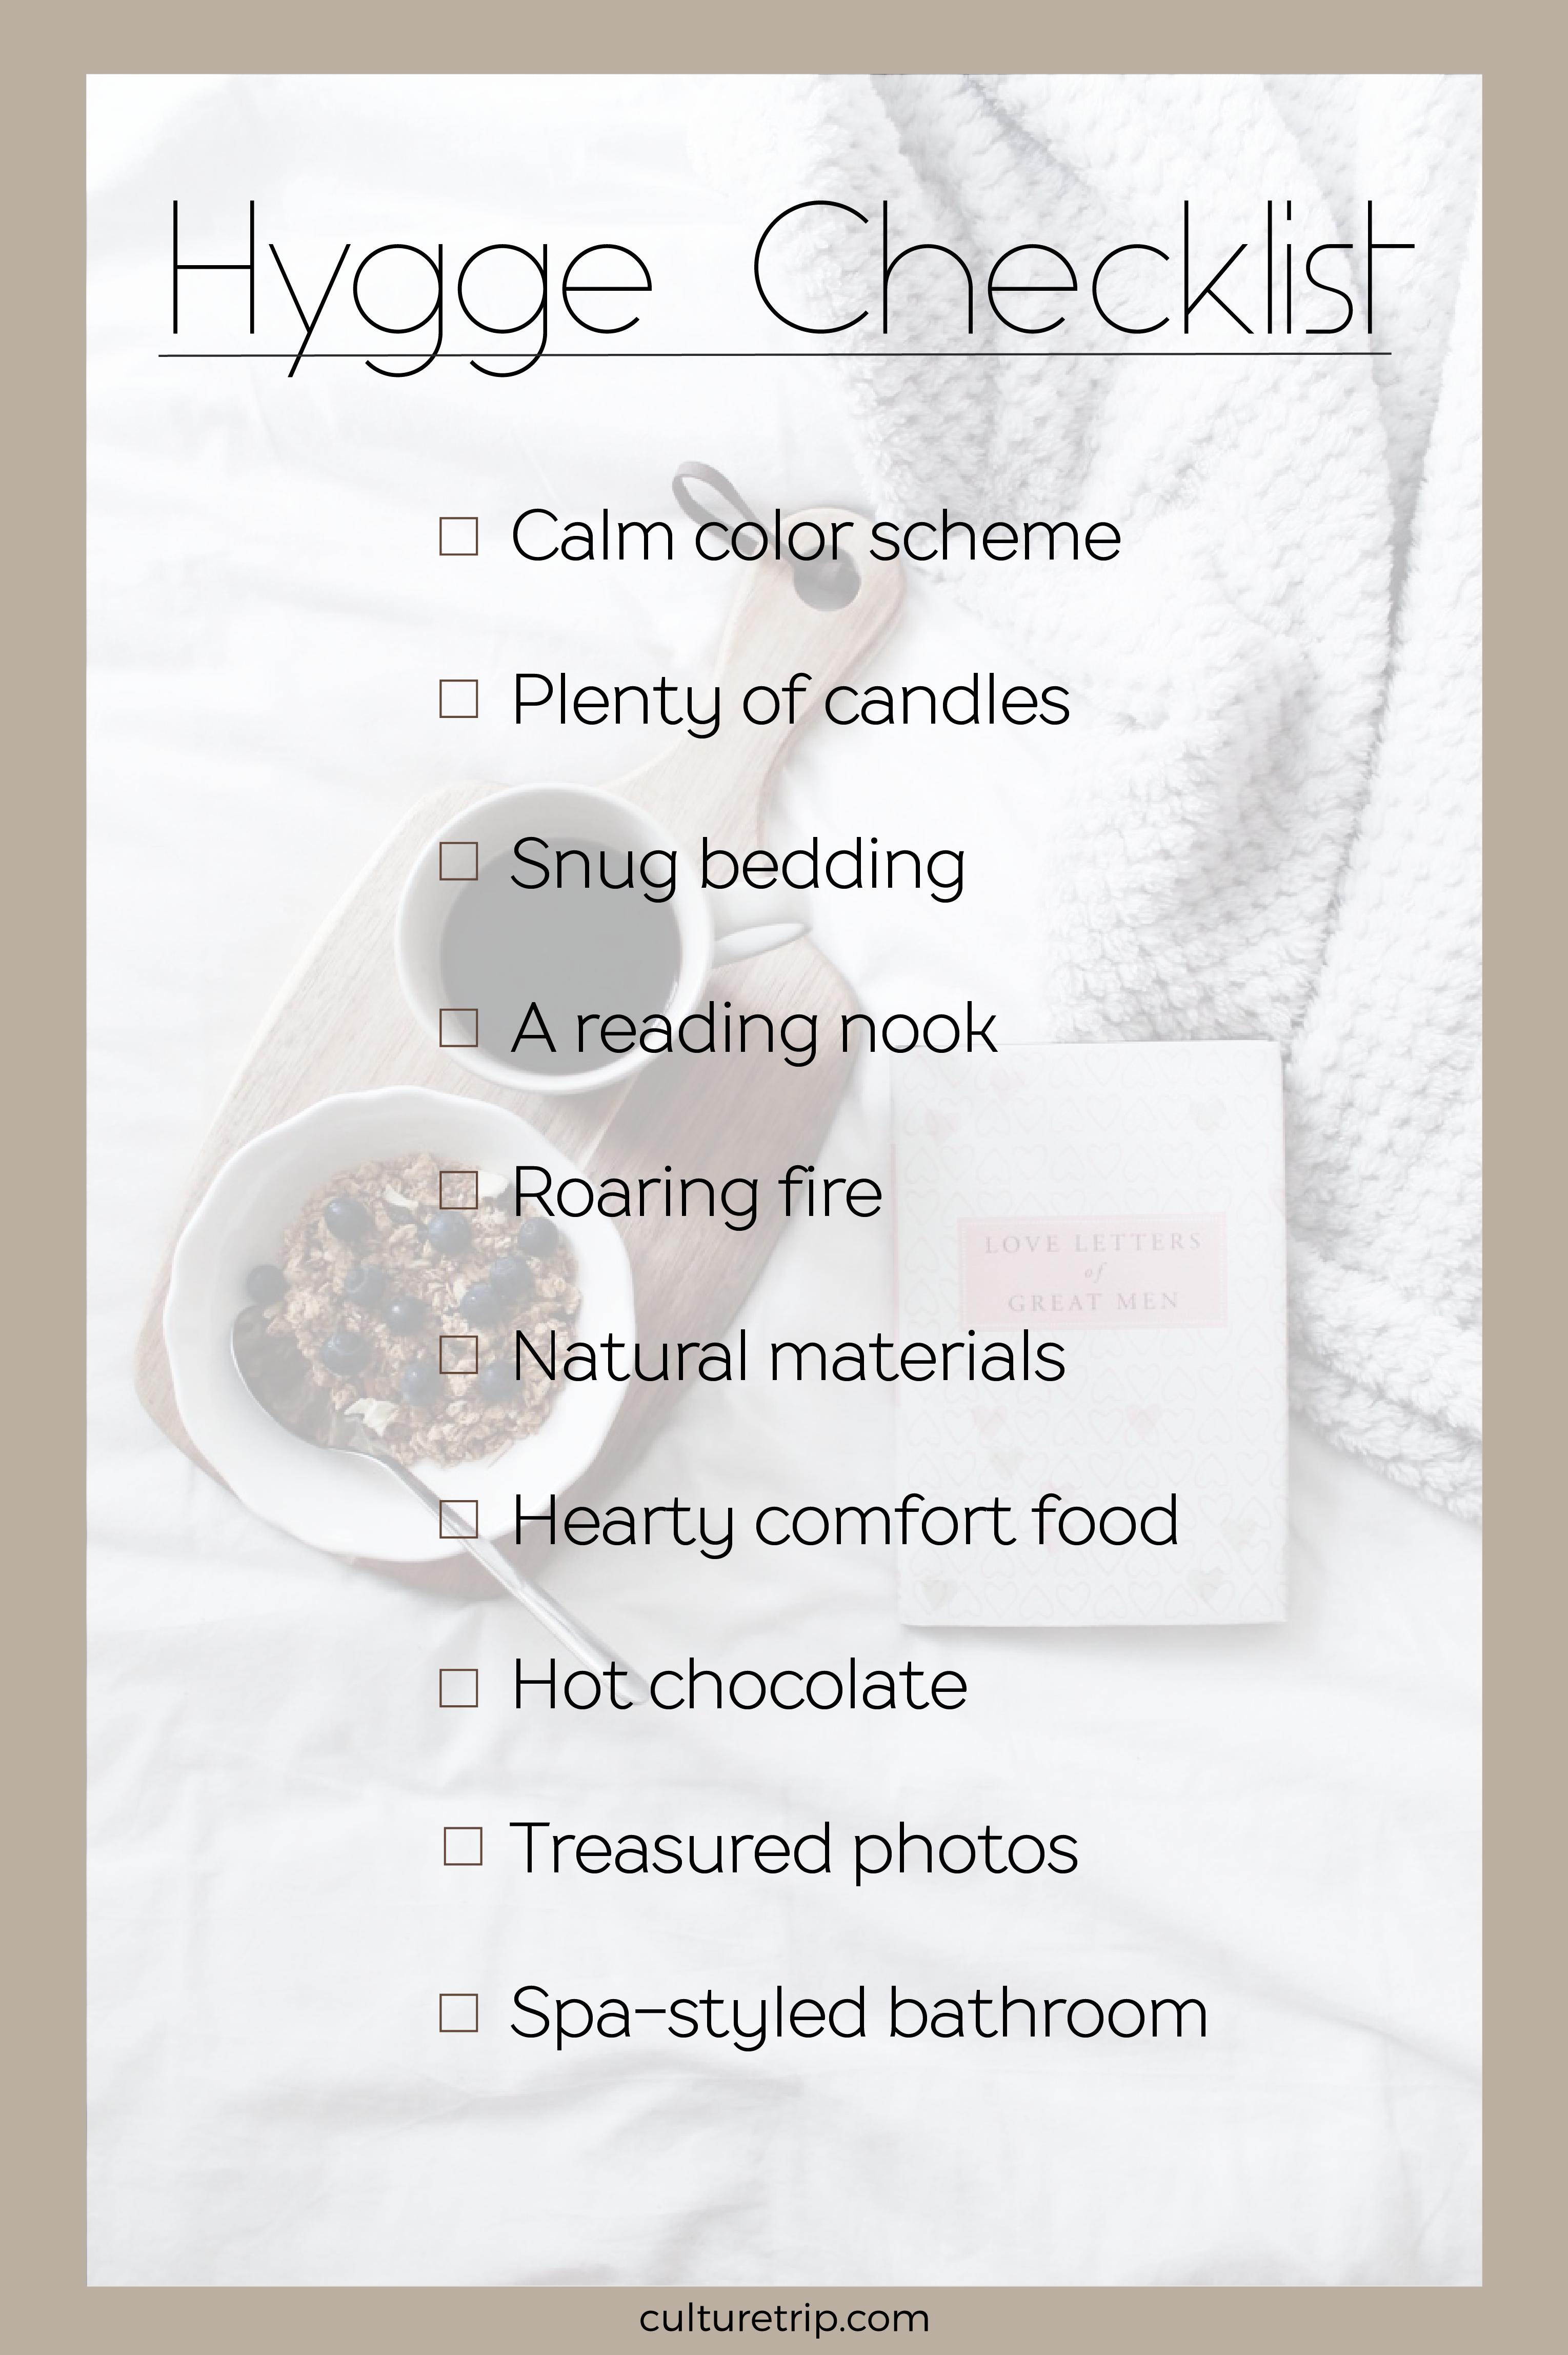 12 Ways To Create The Danish Hygge Look At Home | Danish ...